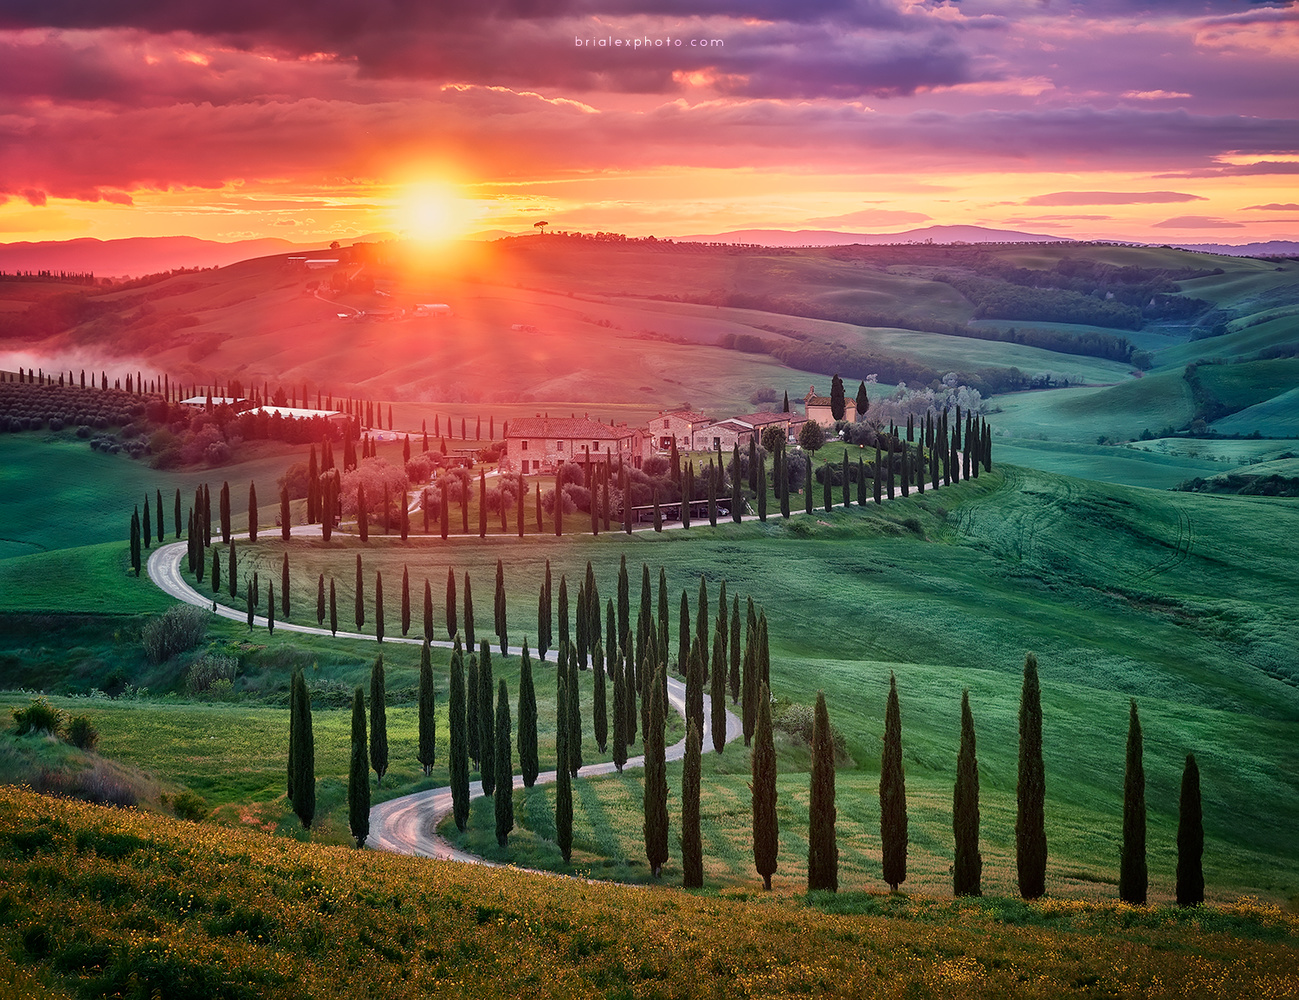 Tuscan Sunset by Brighilă Alex